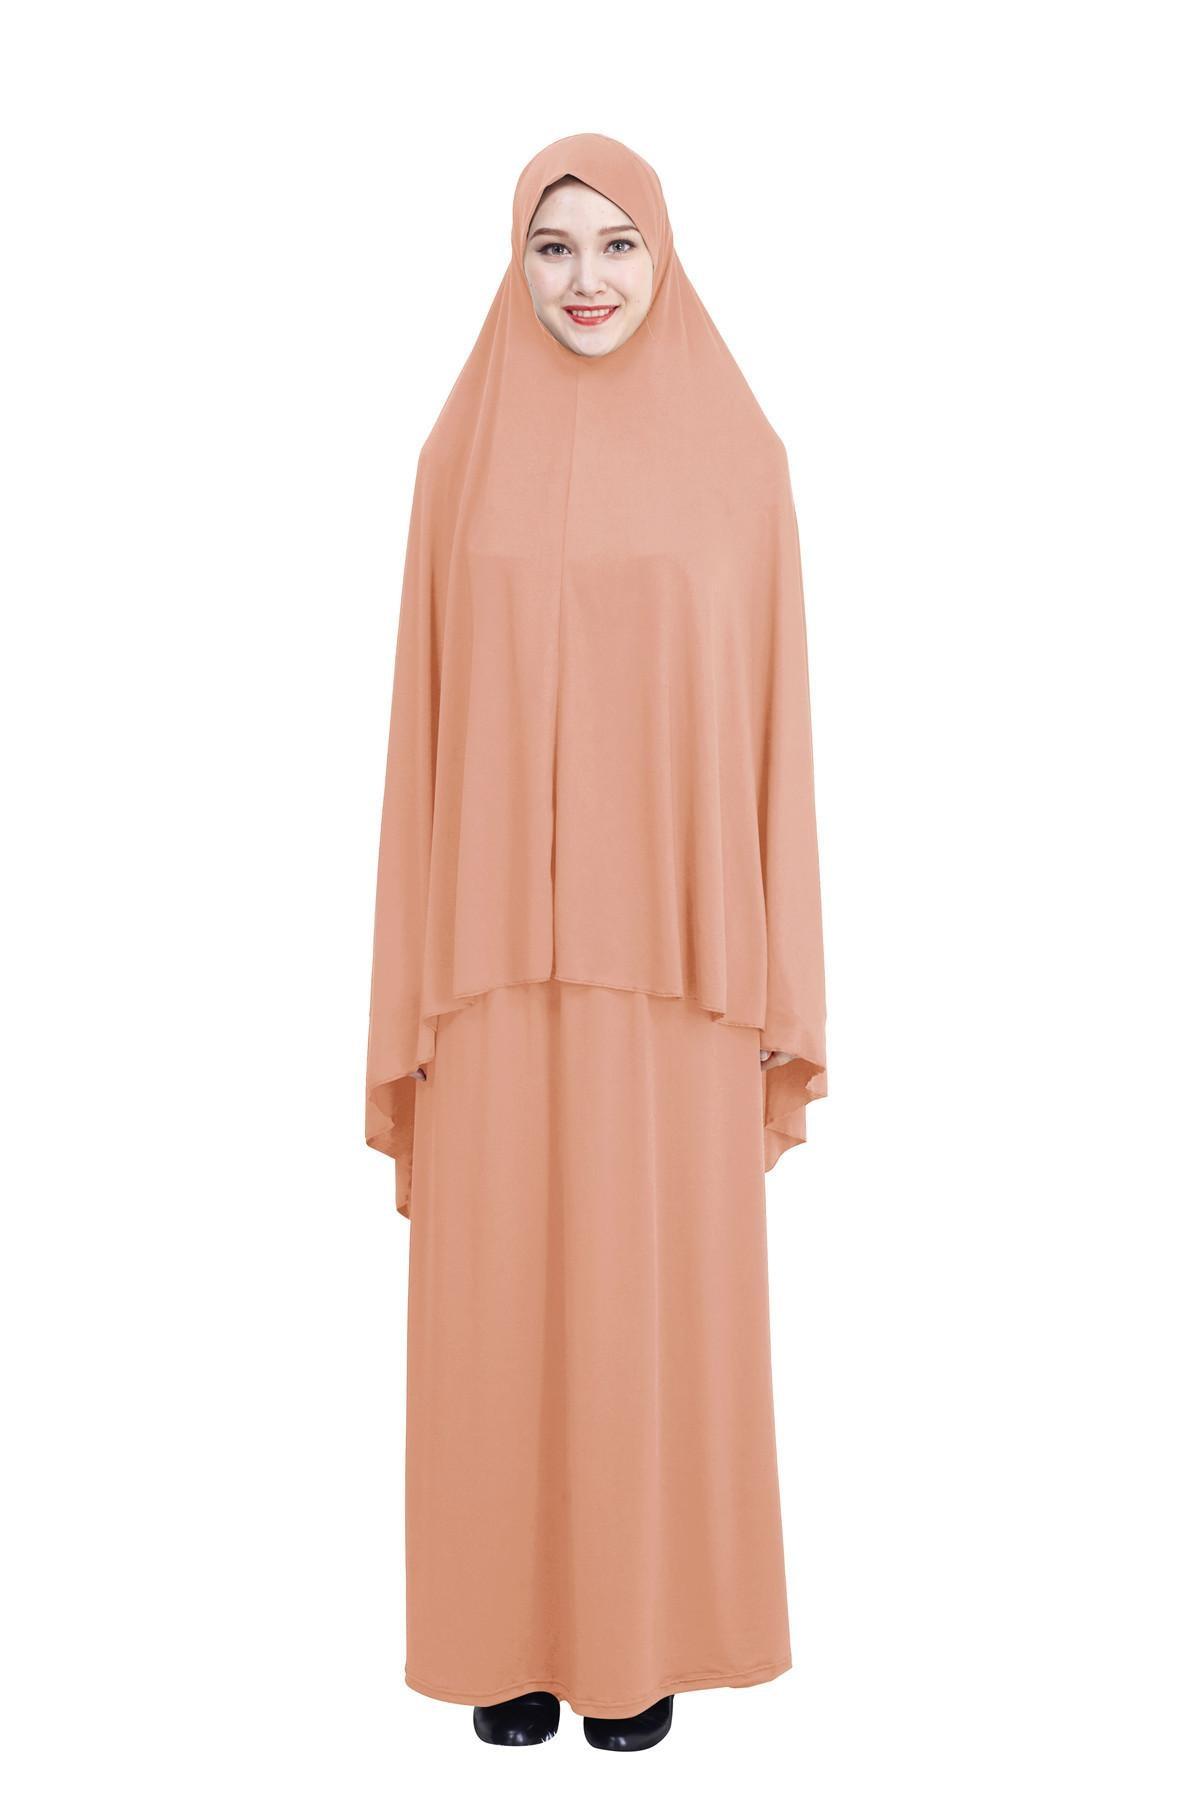 Ramadan Muslim Prayer Garment Islamic Khimar Long Hijab Scarf Jilbab Arab Dress Abaya Middle East Worship Service Full Cover New